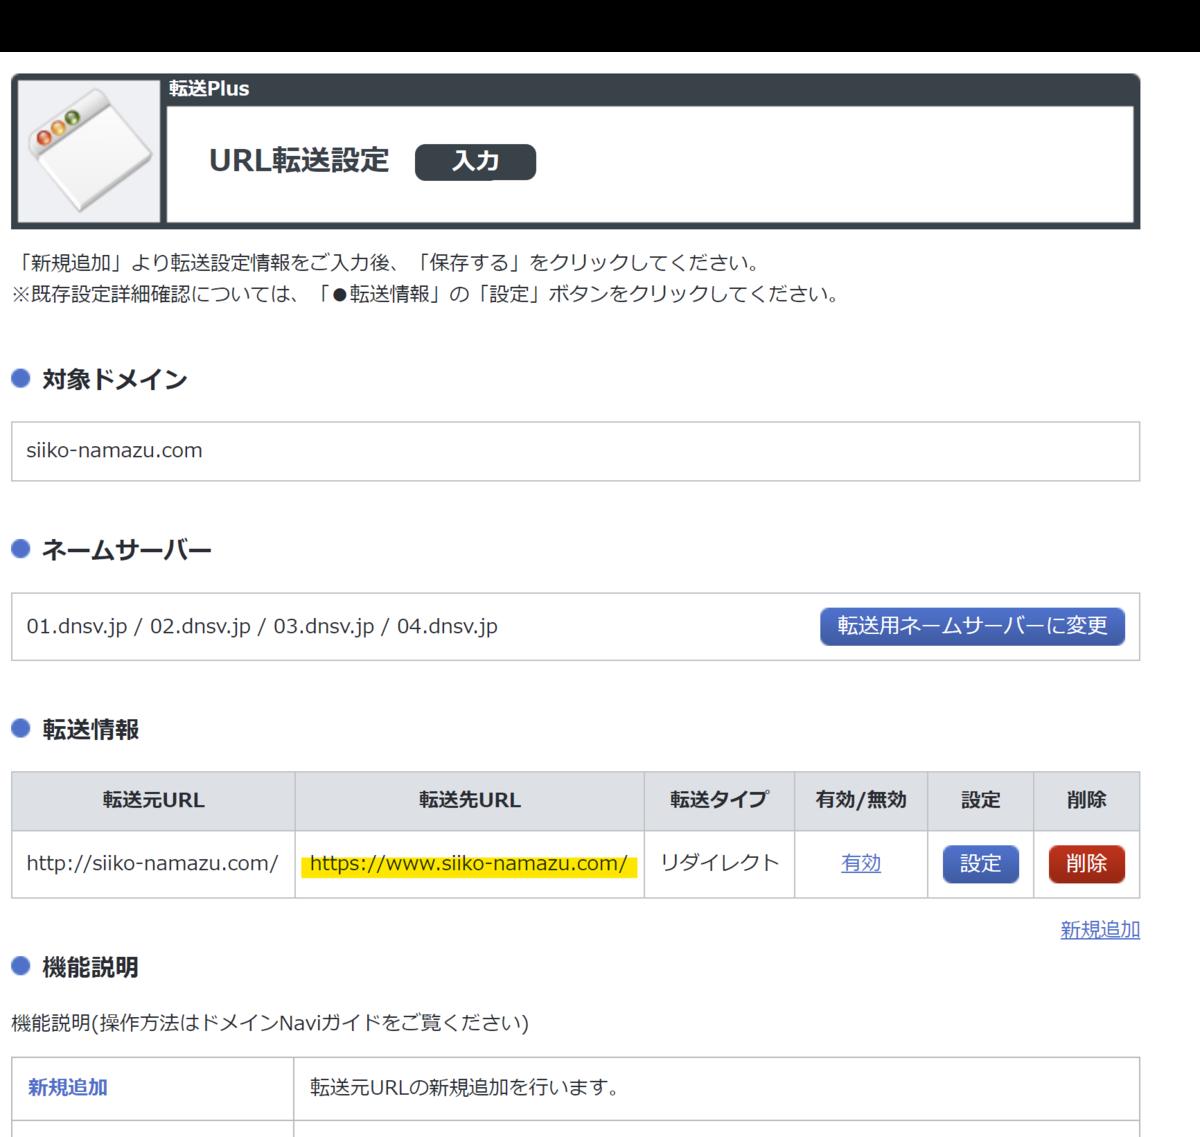 f:id:siiko-namazu:20200209125053p:plain